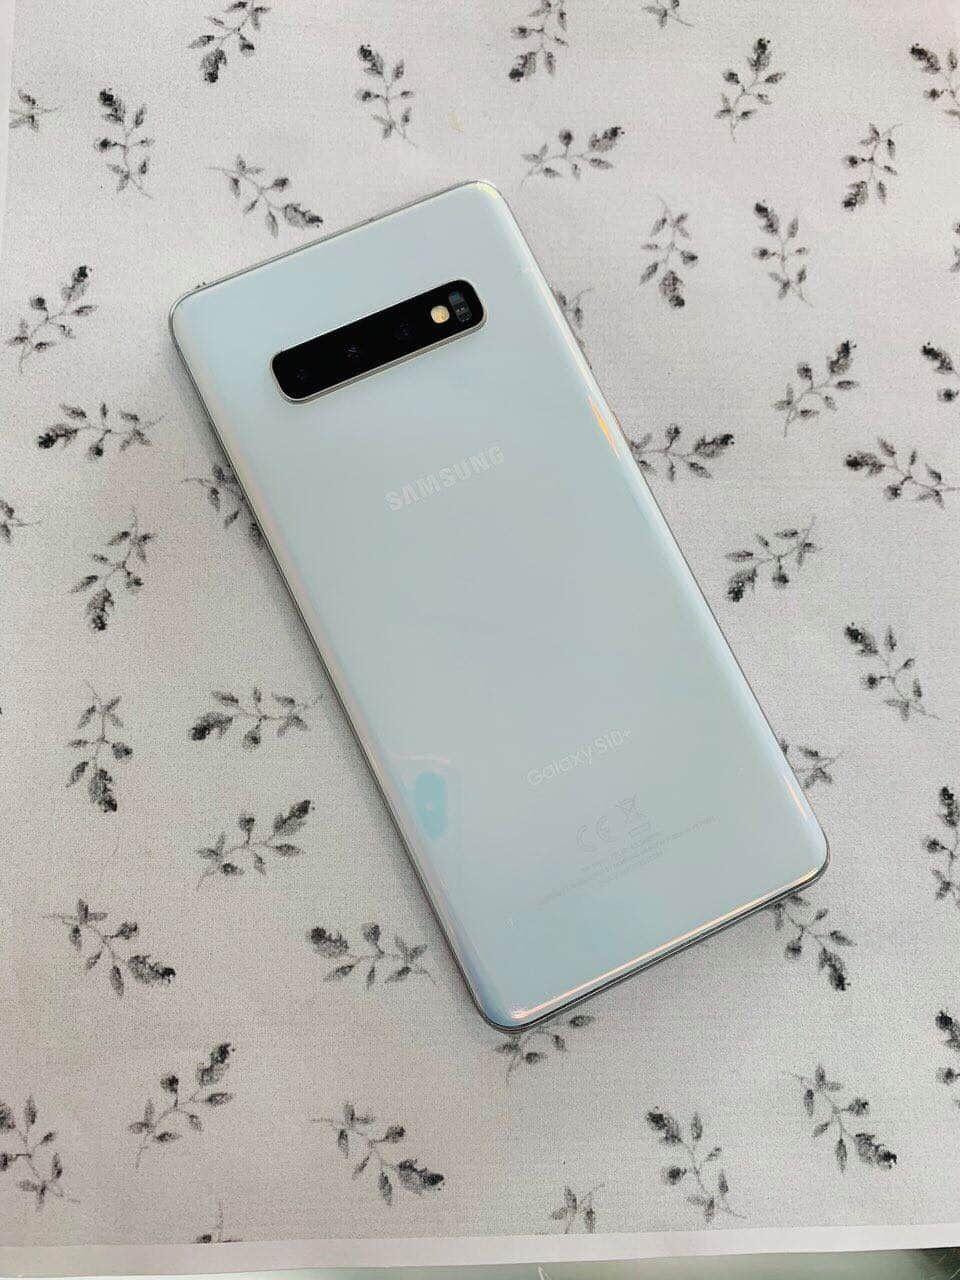 Samsung Galaxy S10 Plus (128 GB) Excellent Condition With Warranty